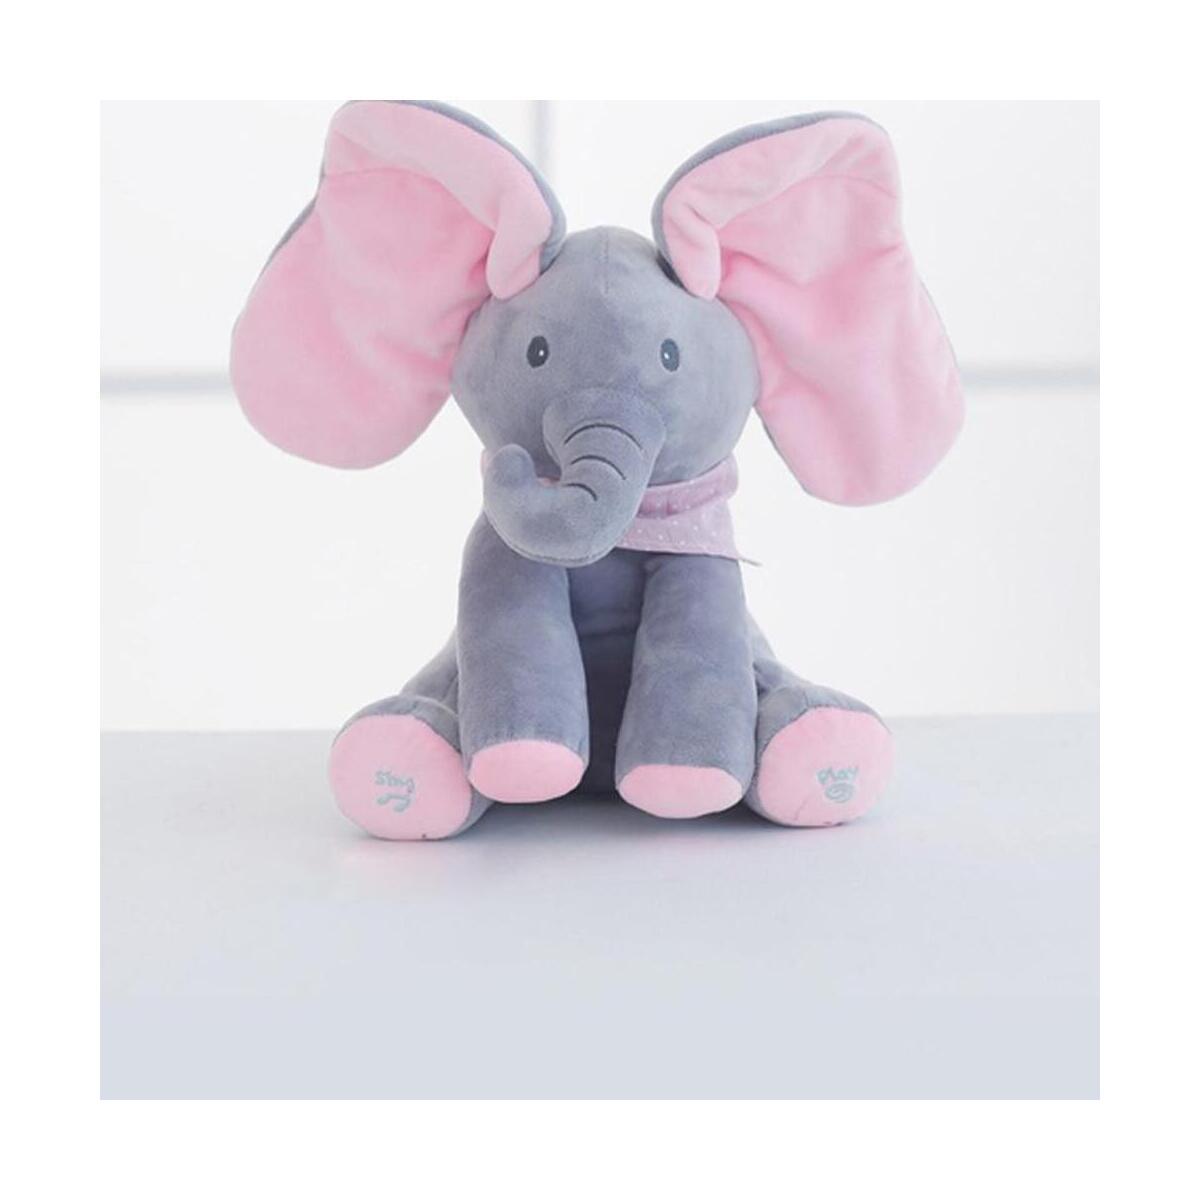 Peek-a-boo Elephant Baby Plush Toy Talking Singing Stuffed Music Cute Doll